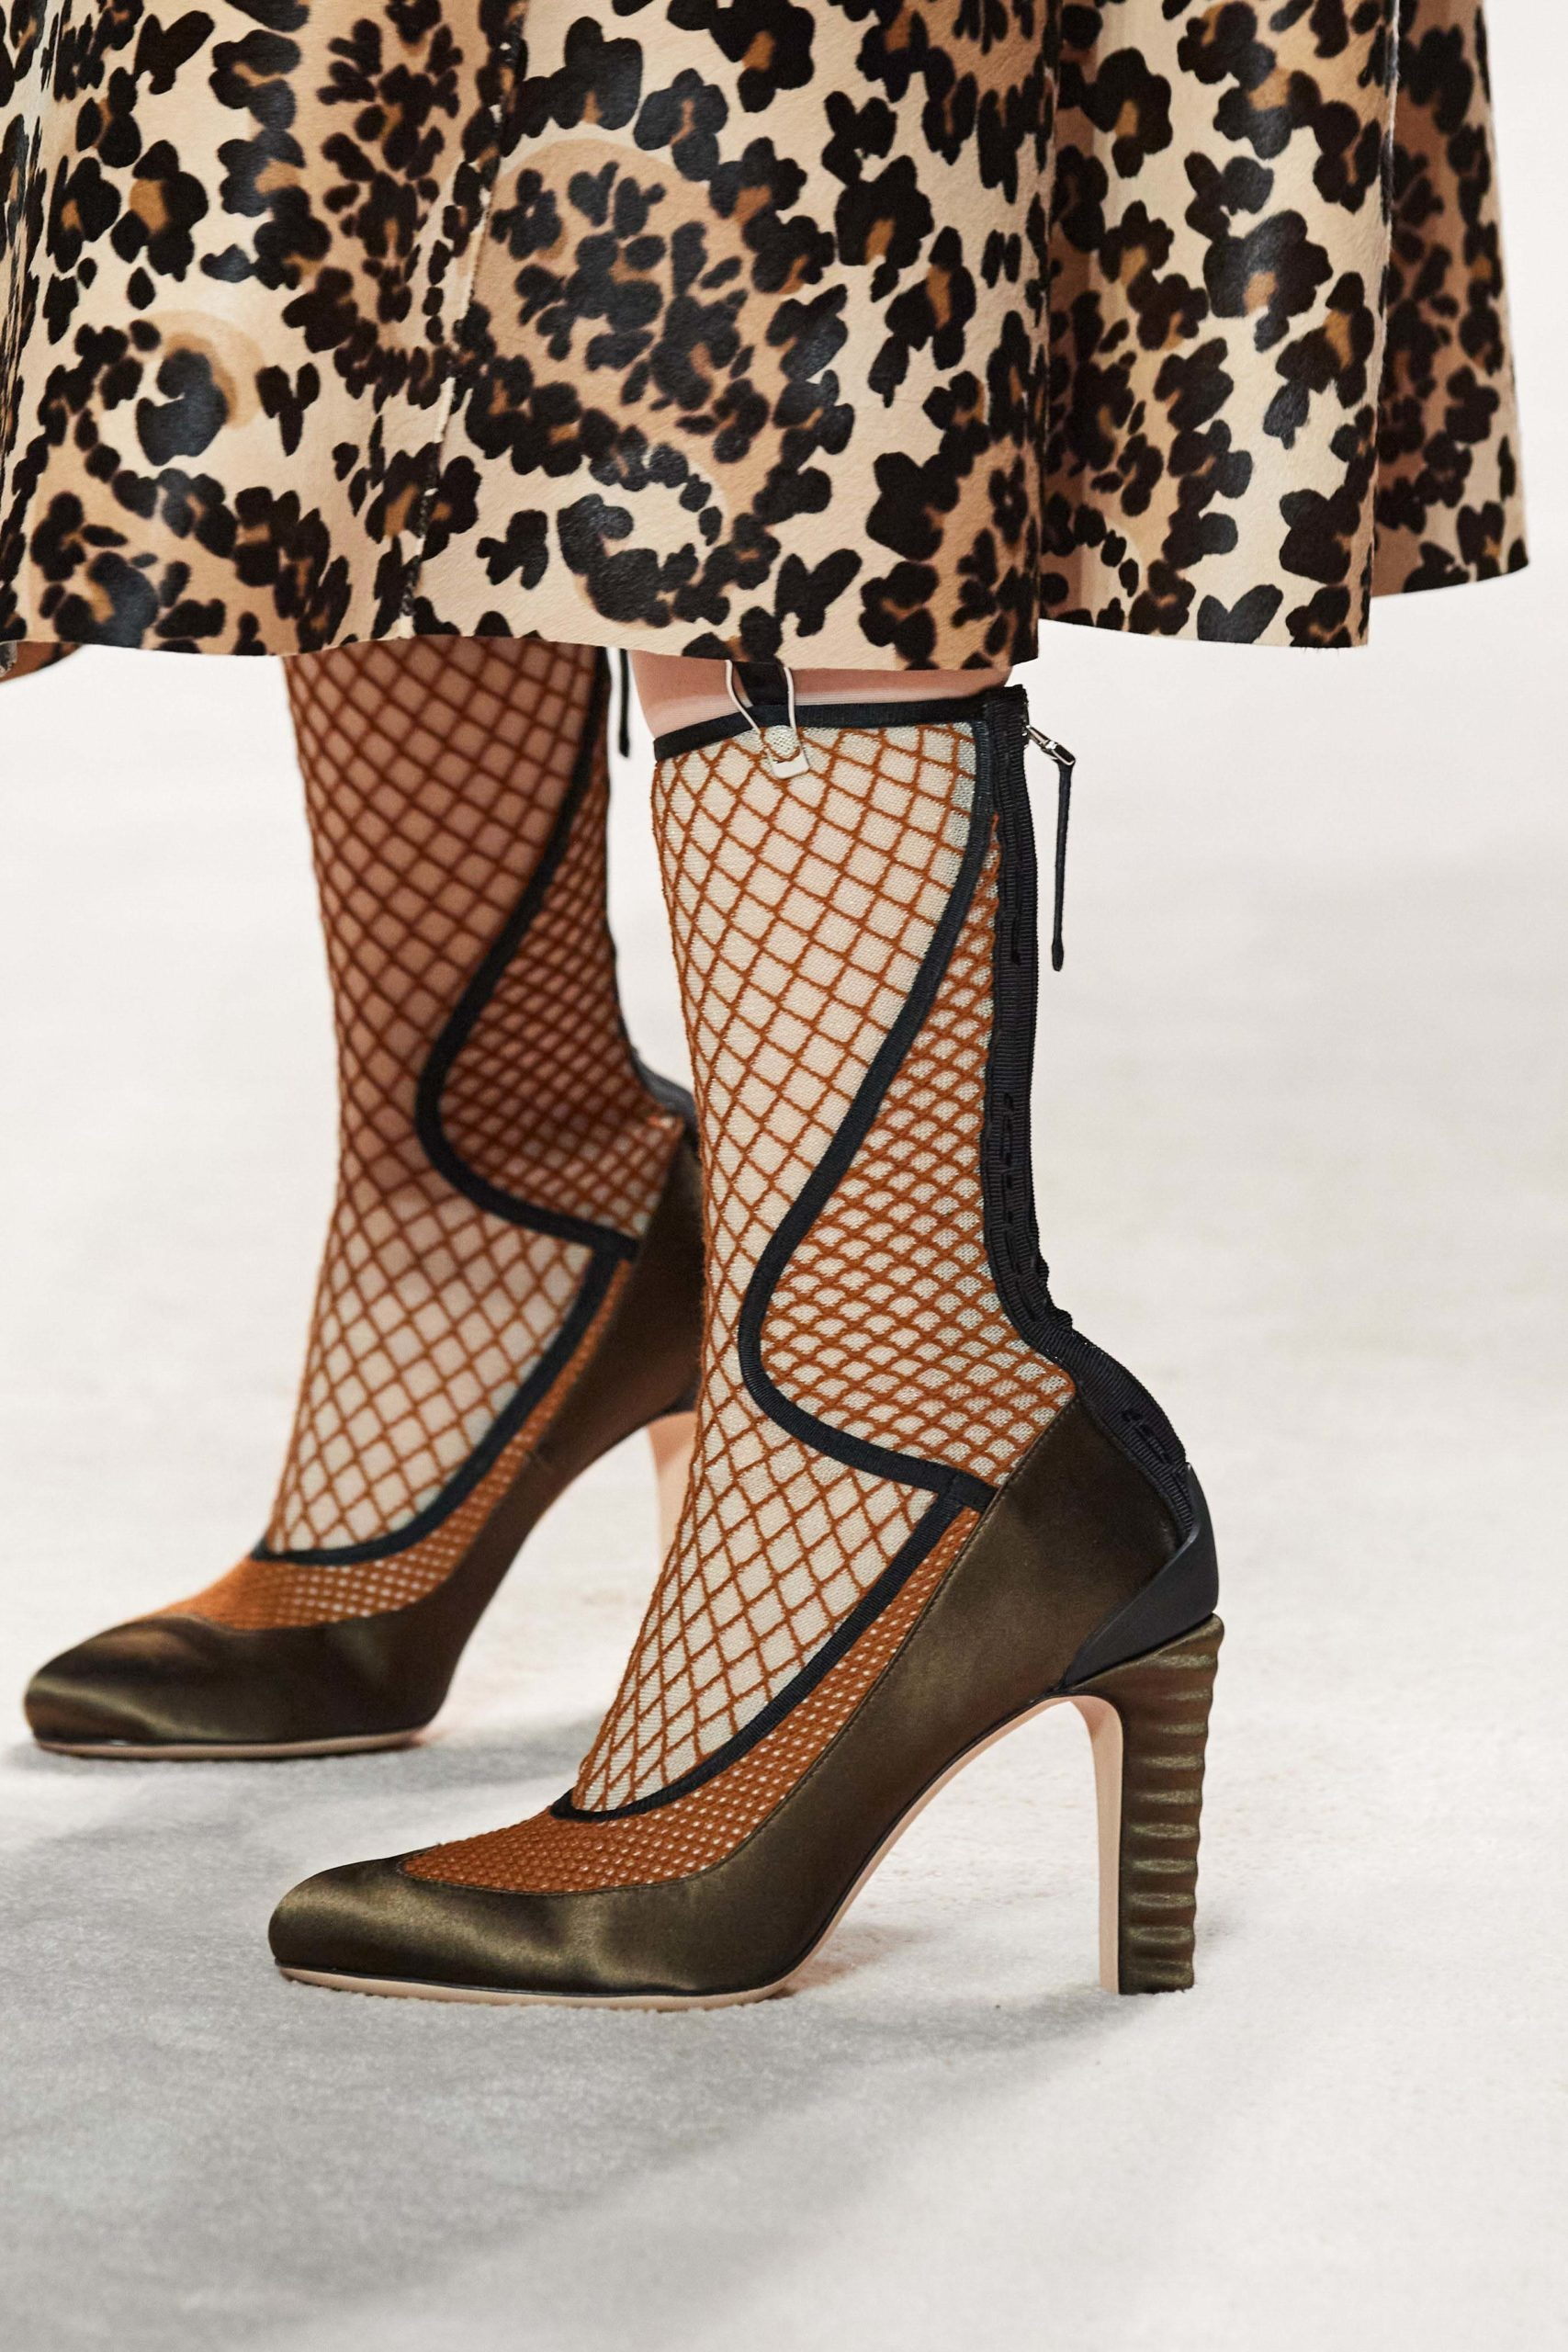 Fendi Fall 2020 trends runway report Ready To Wear Vogue fendi pumps mesh best of 2020 shoes